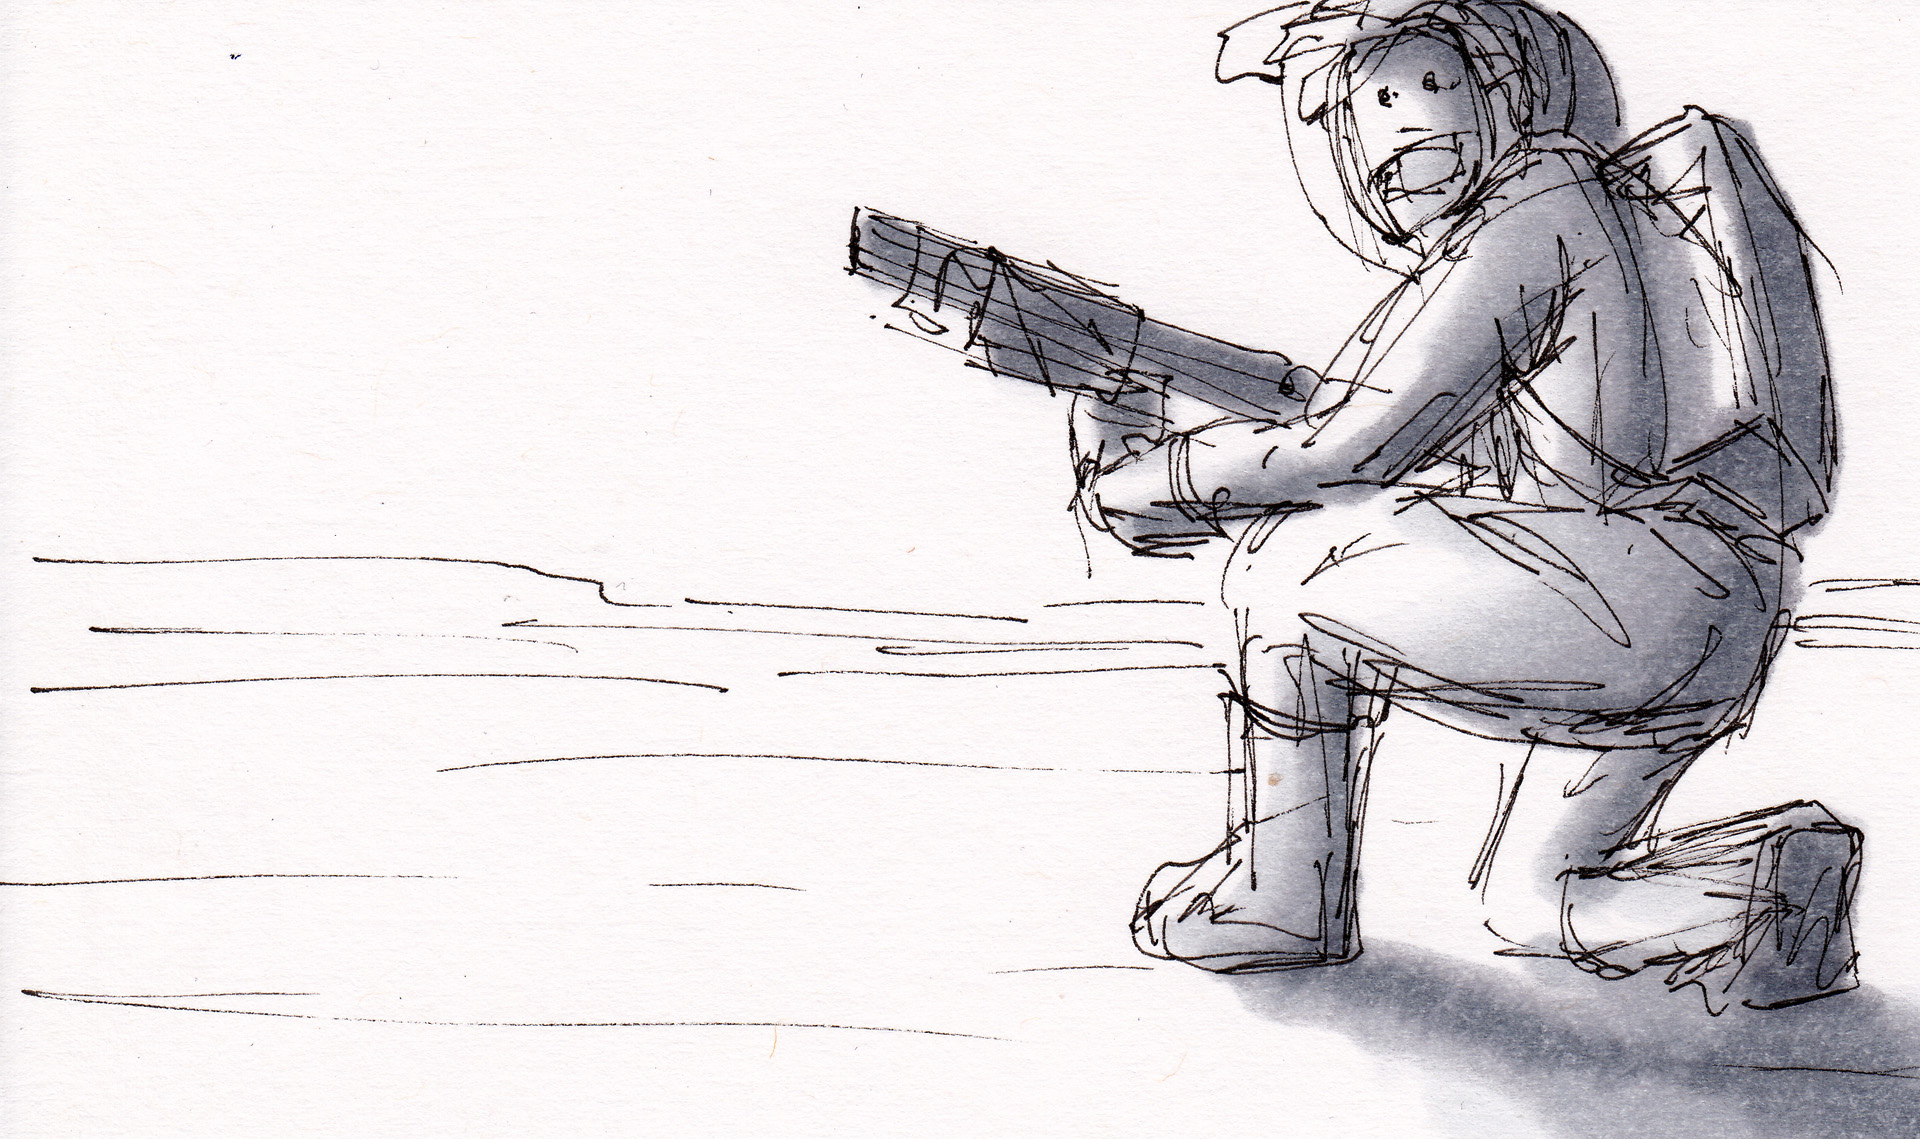 Storyboard__0031_Layer 17.jpg